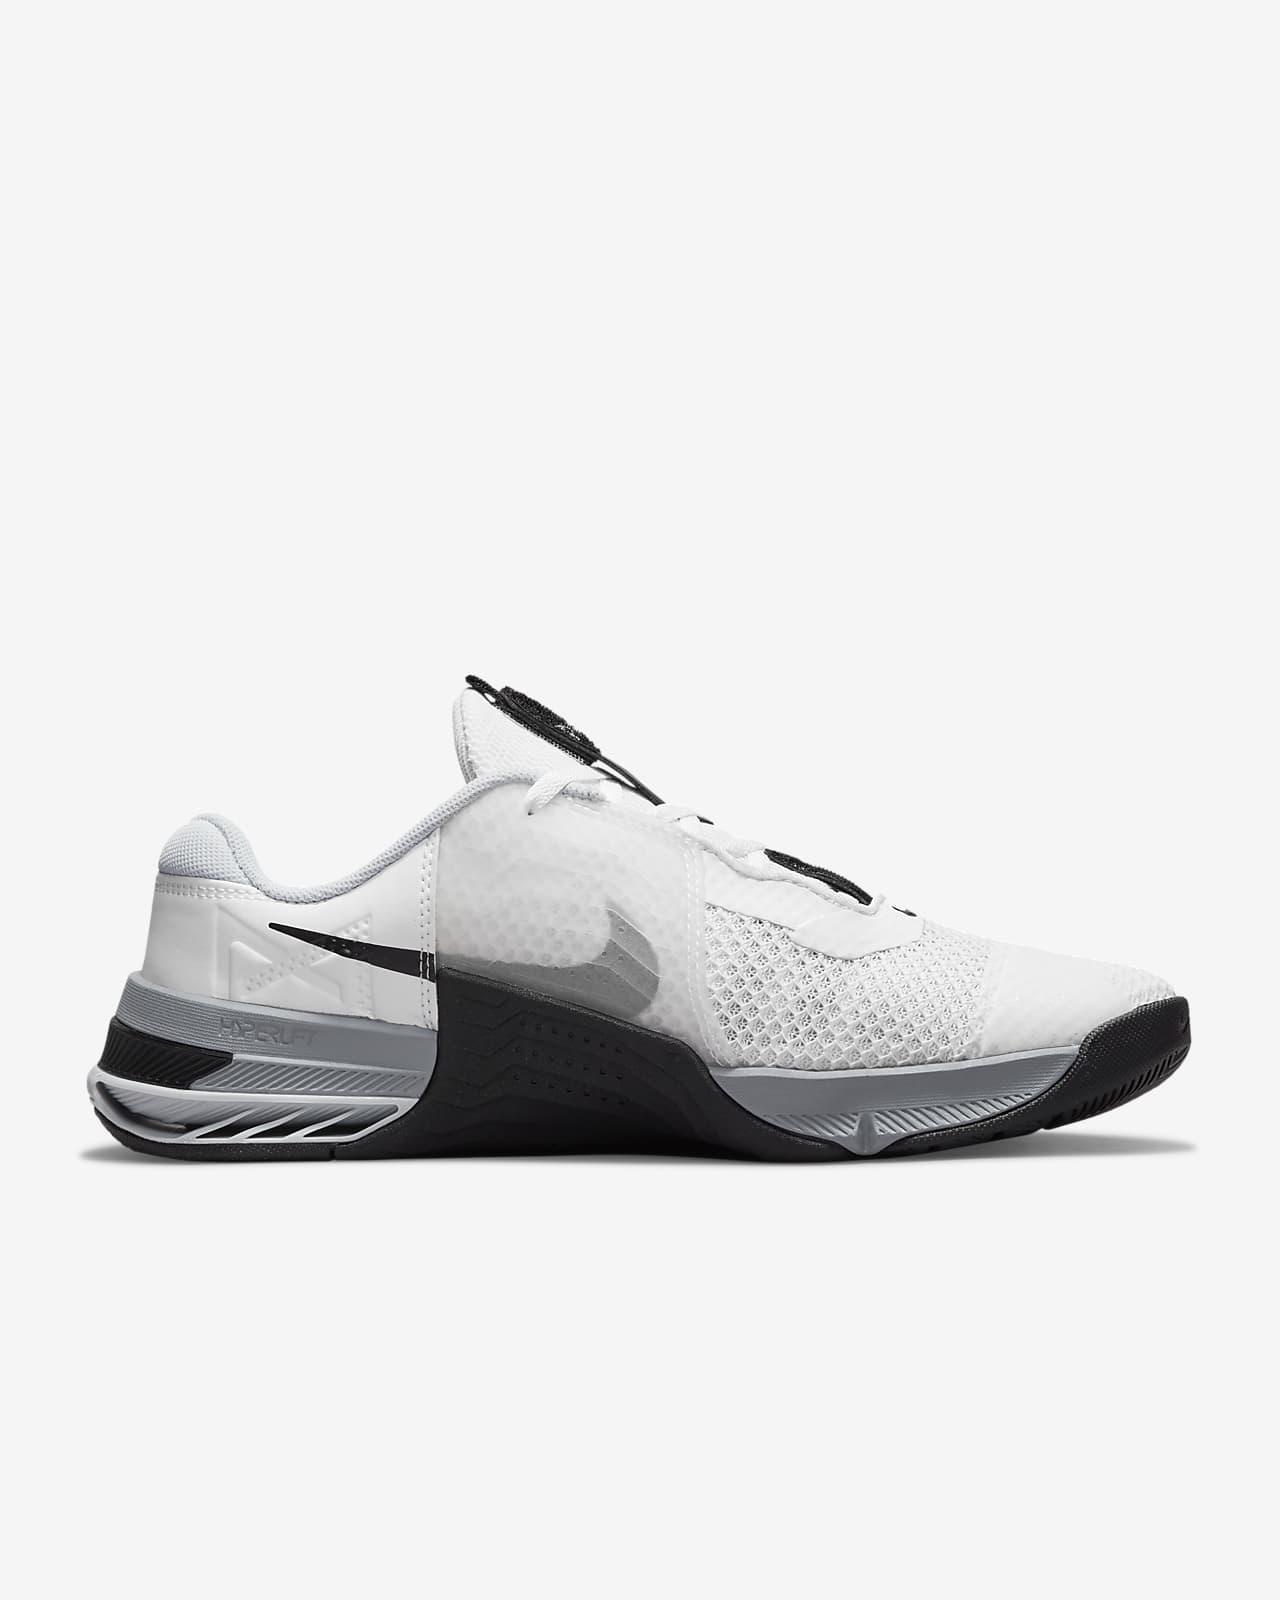 Chaussure de training Nike Metcon 7